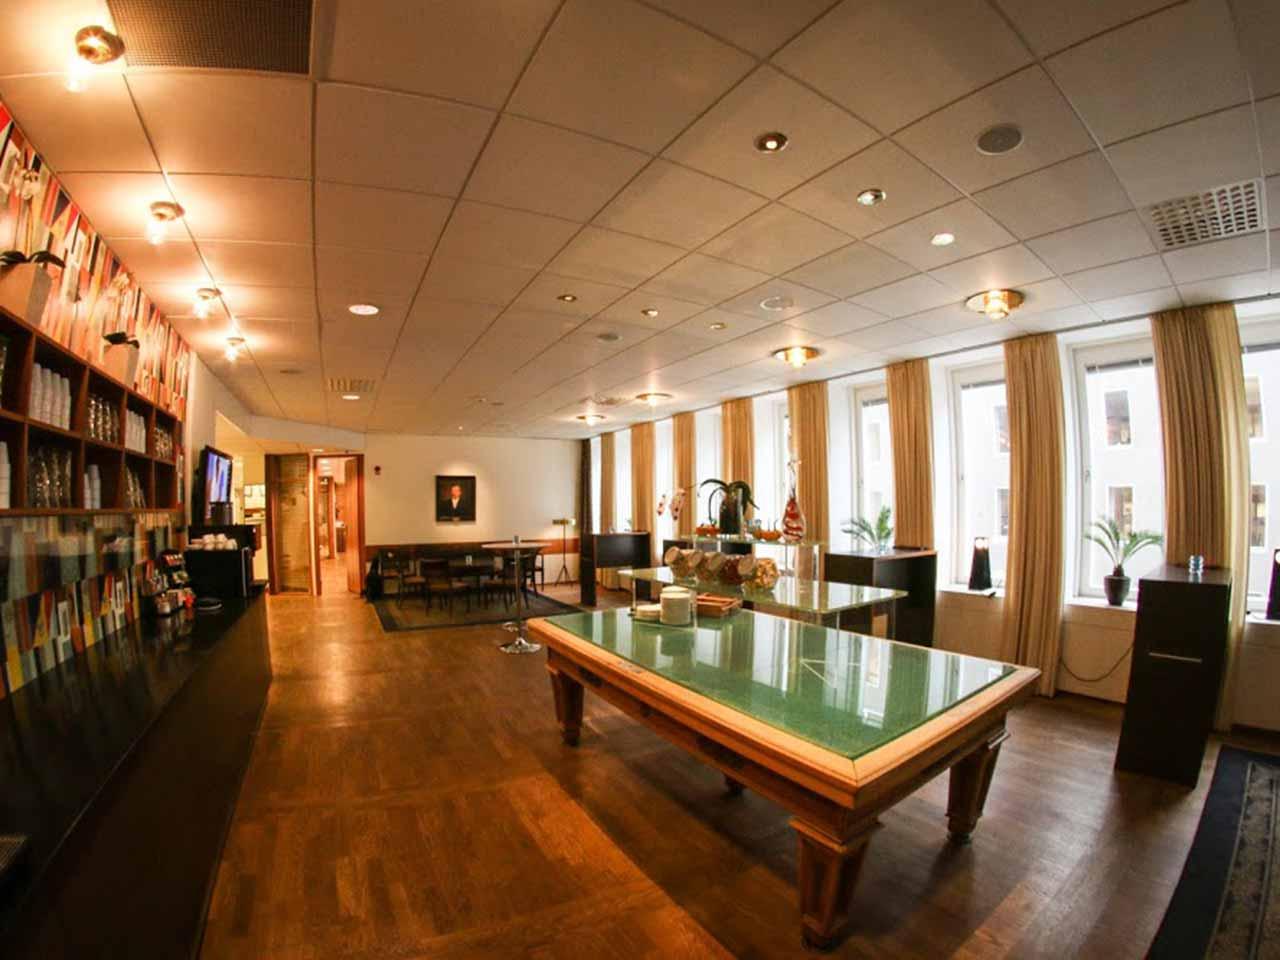 Konferensanläggning Stockholm - Möblerat rum